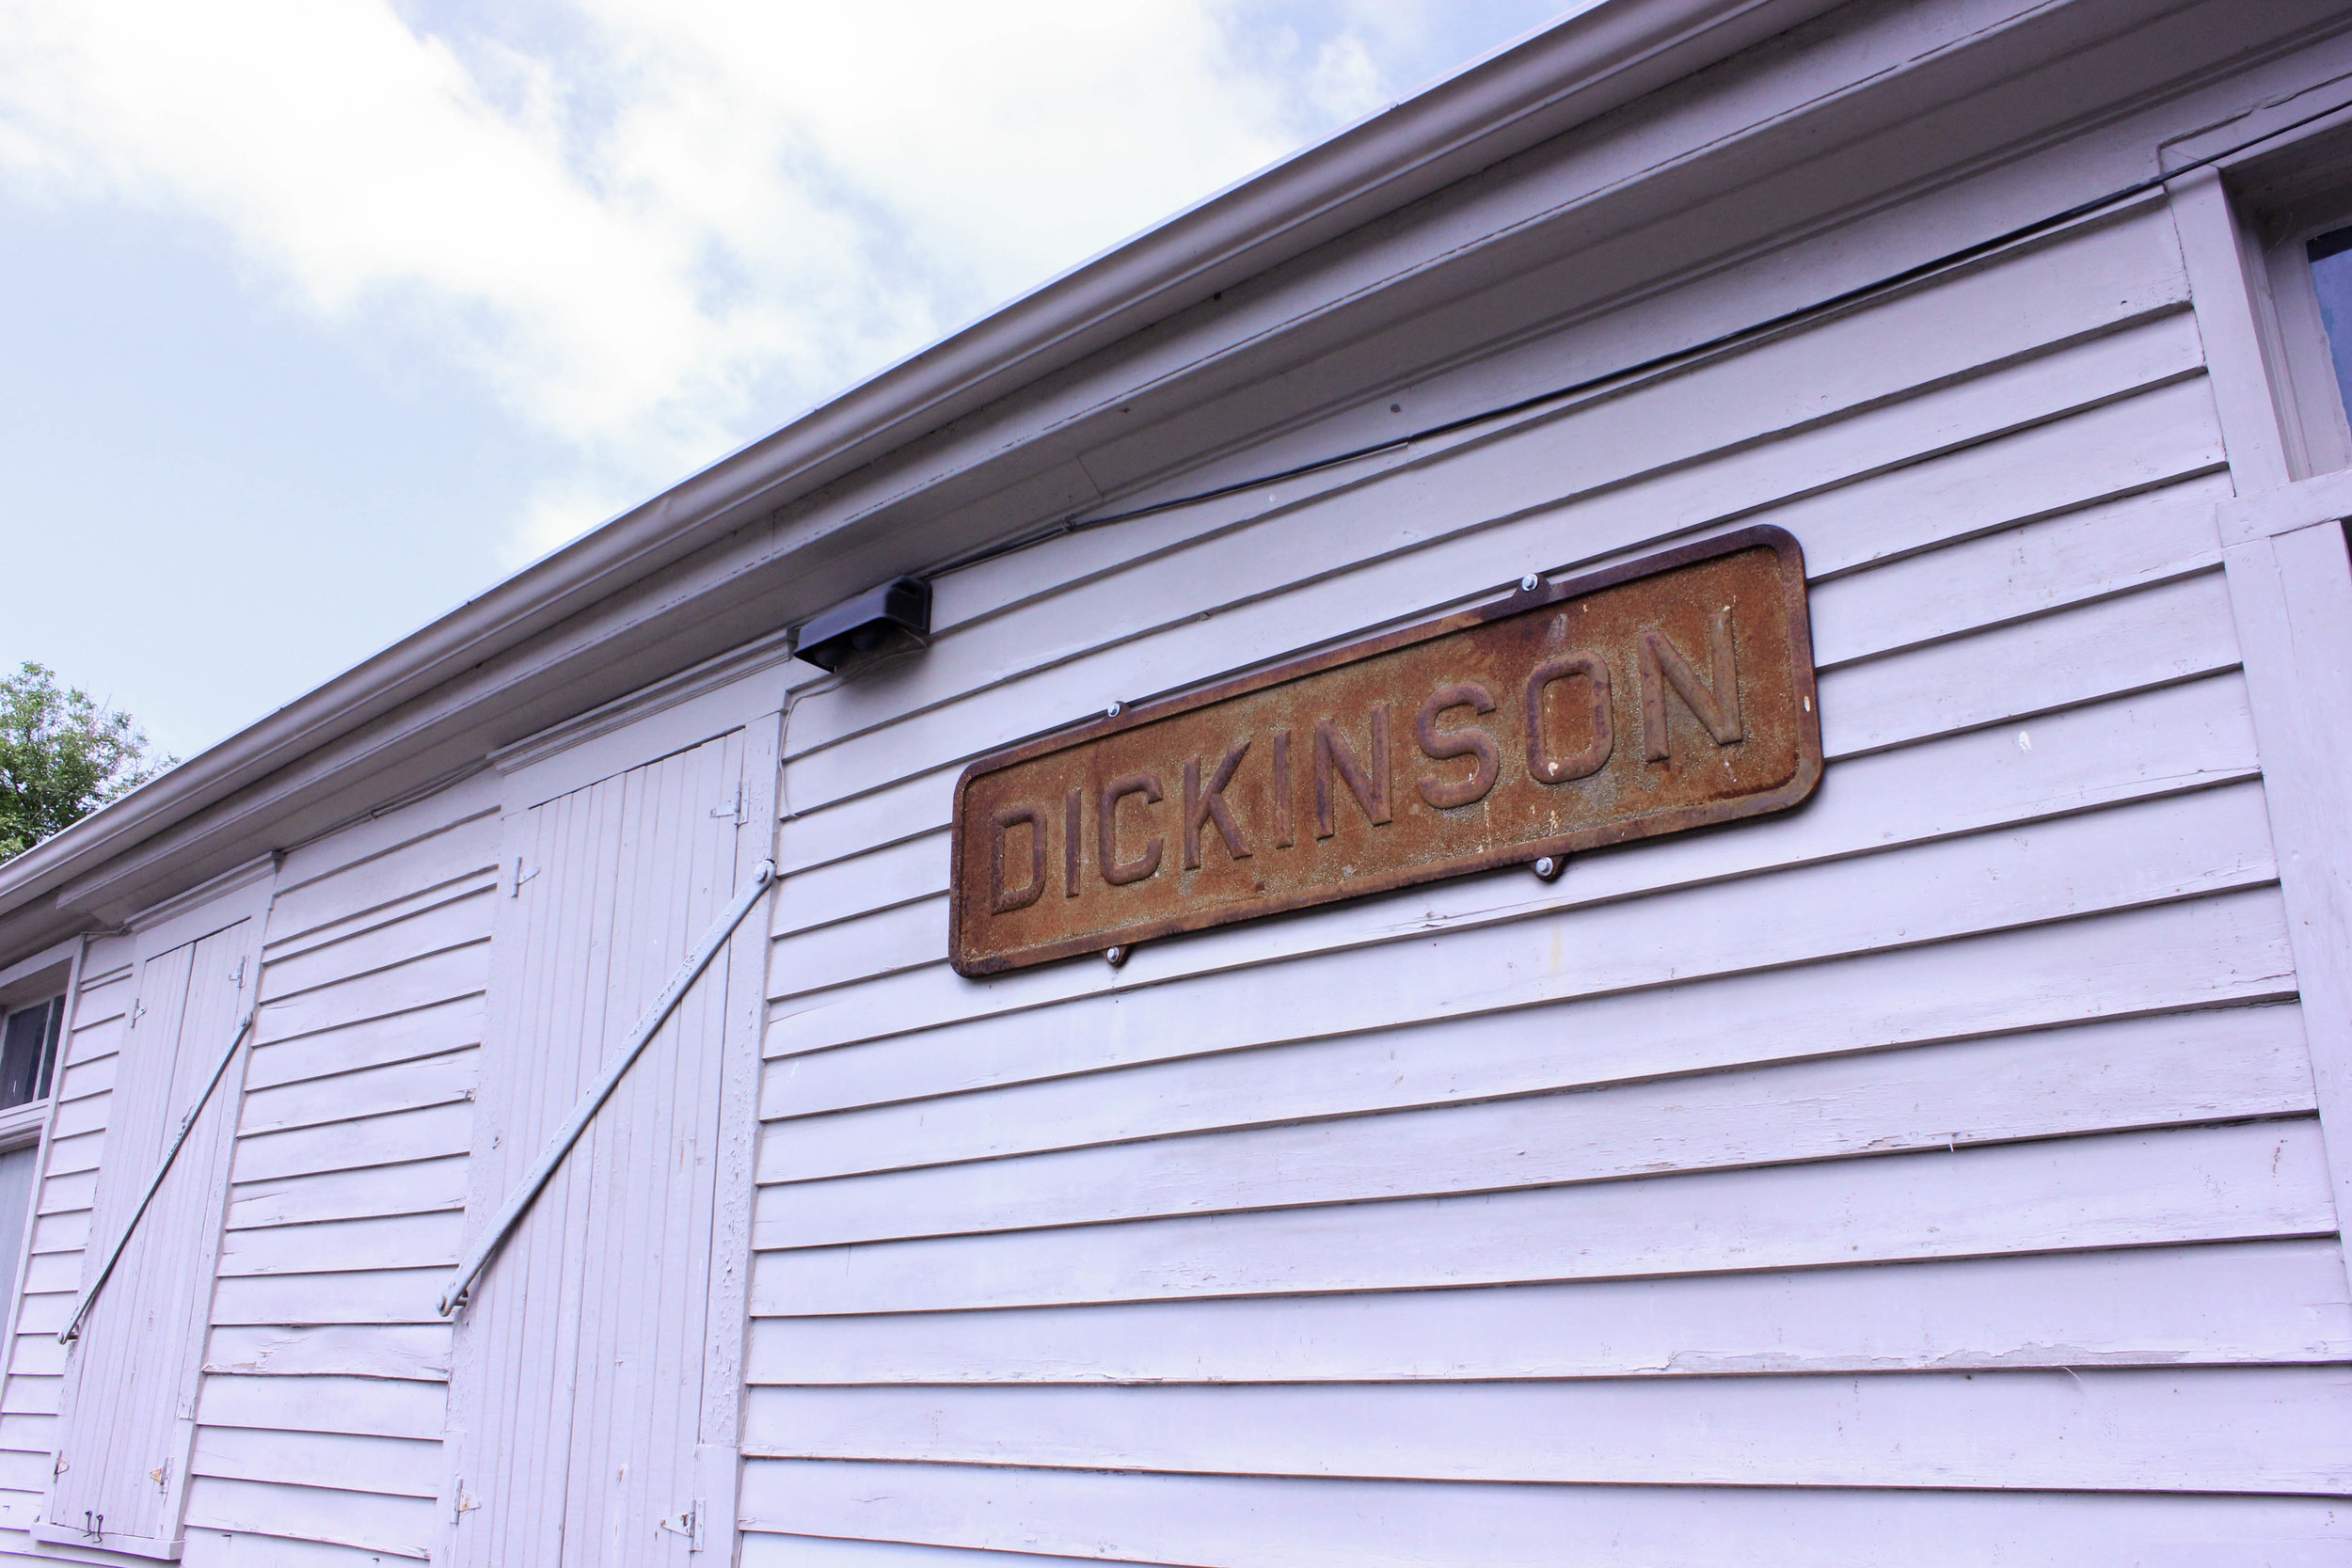 Dickinson-4517.jpg